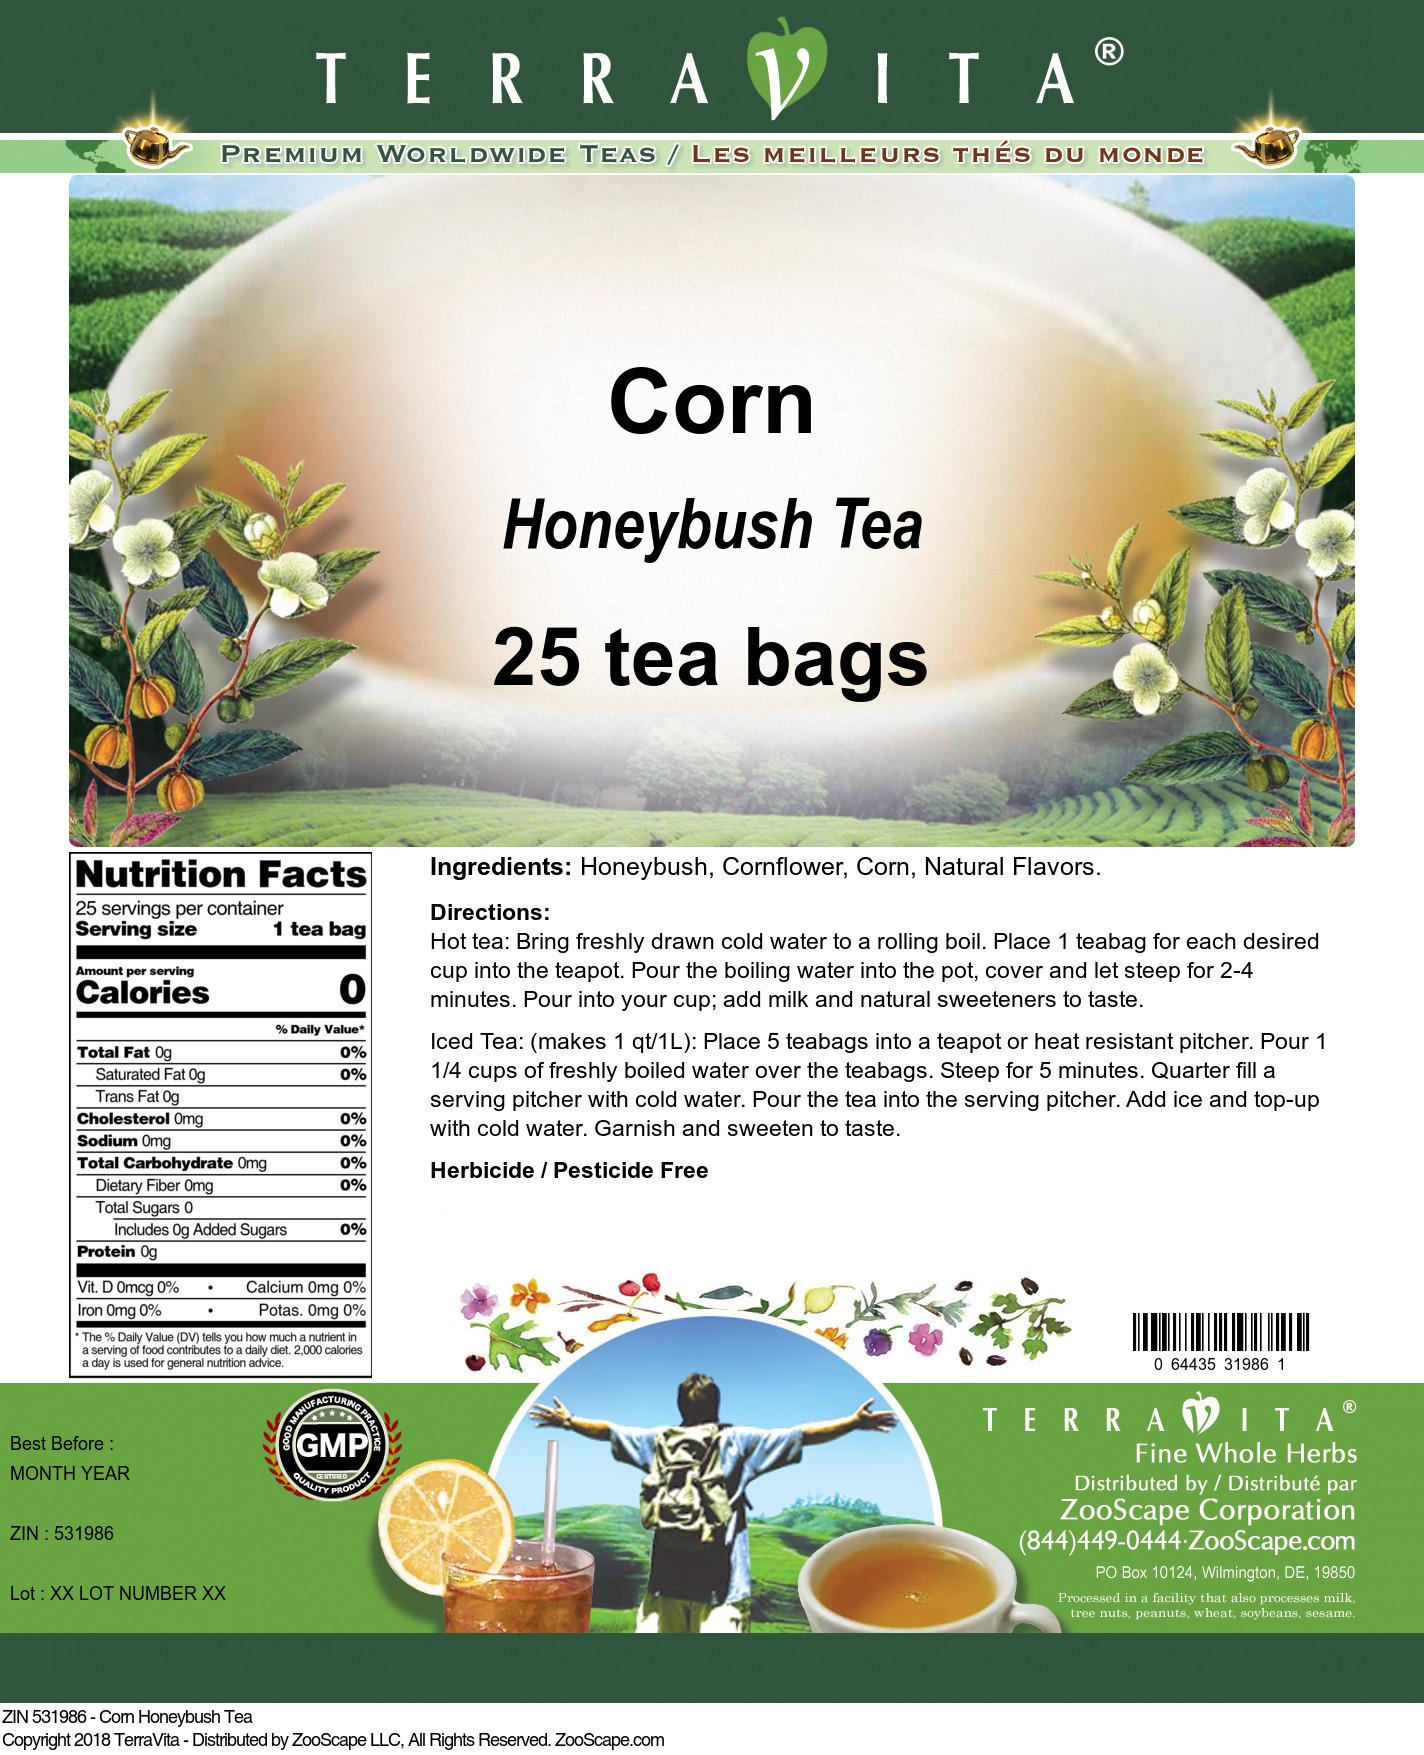 Corn Honeybush Tea